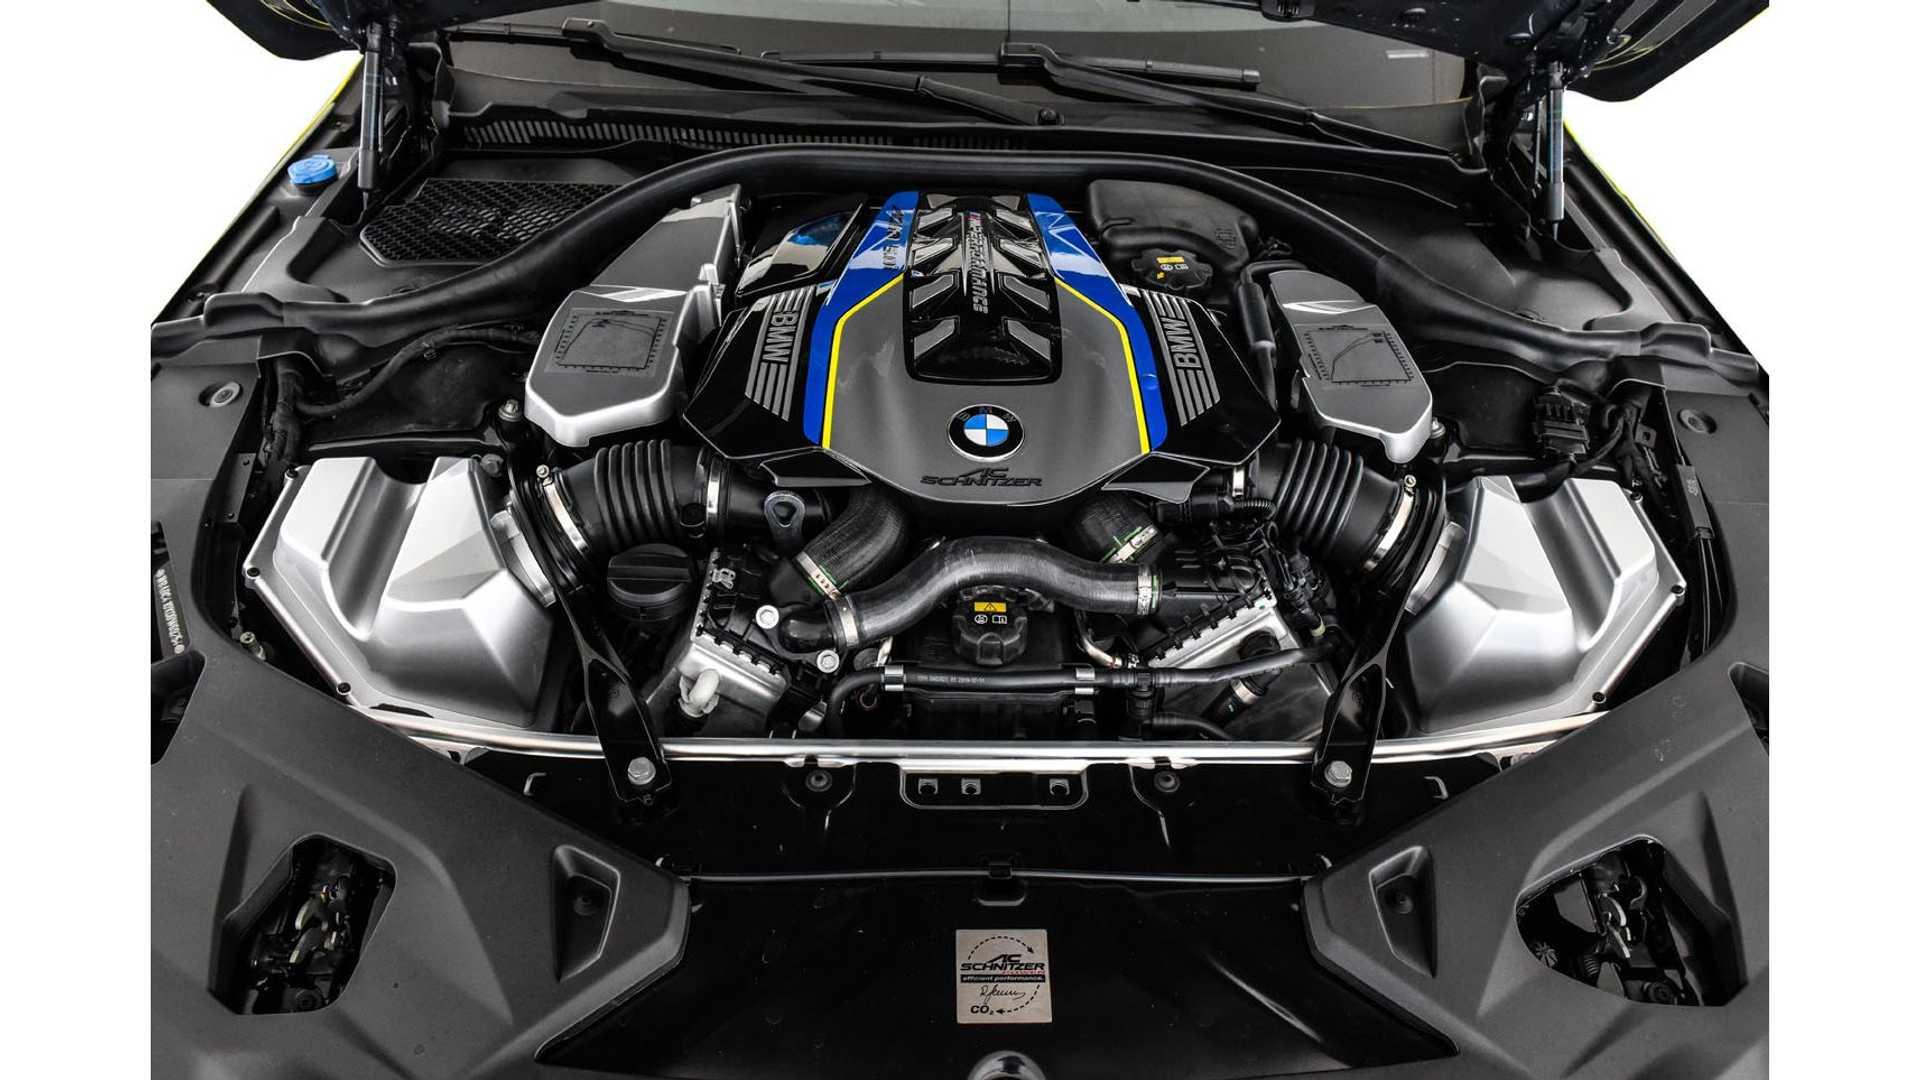 BMW-M850i-police-car-tune-it-safe-41